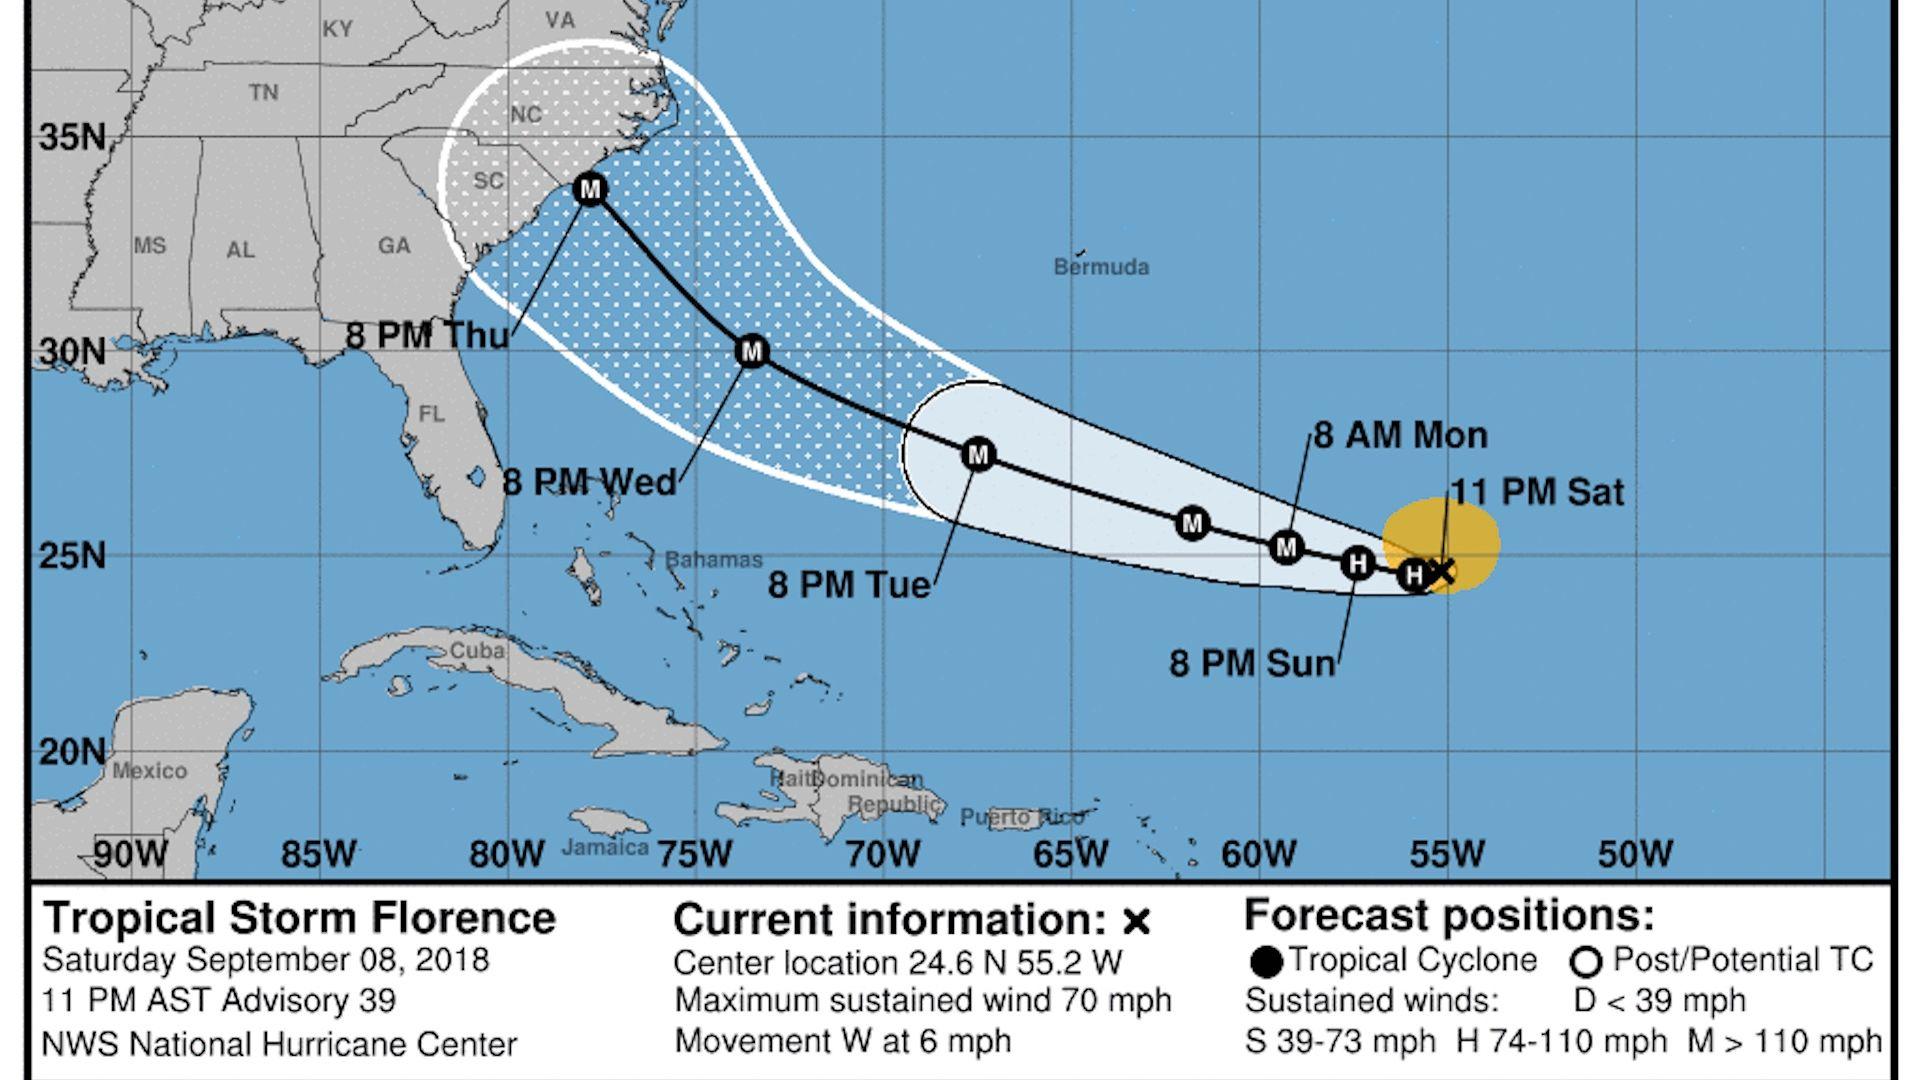 National Hurricane Center's 5-day forecast from Sept. 8, 2018 for Hurricane Florence.